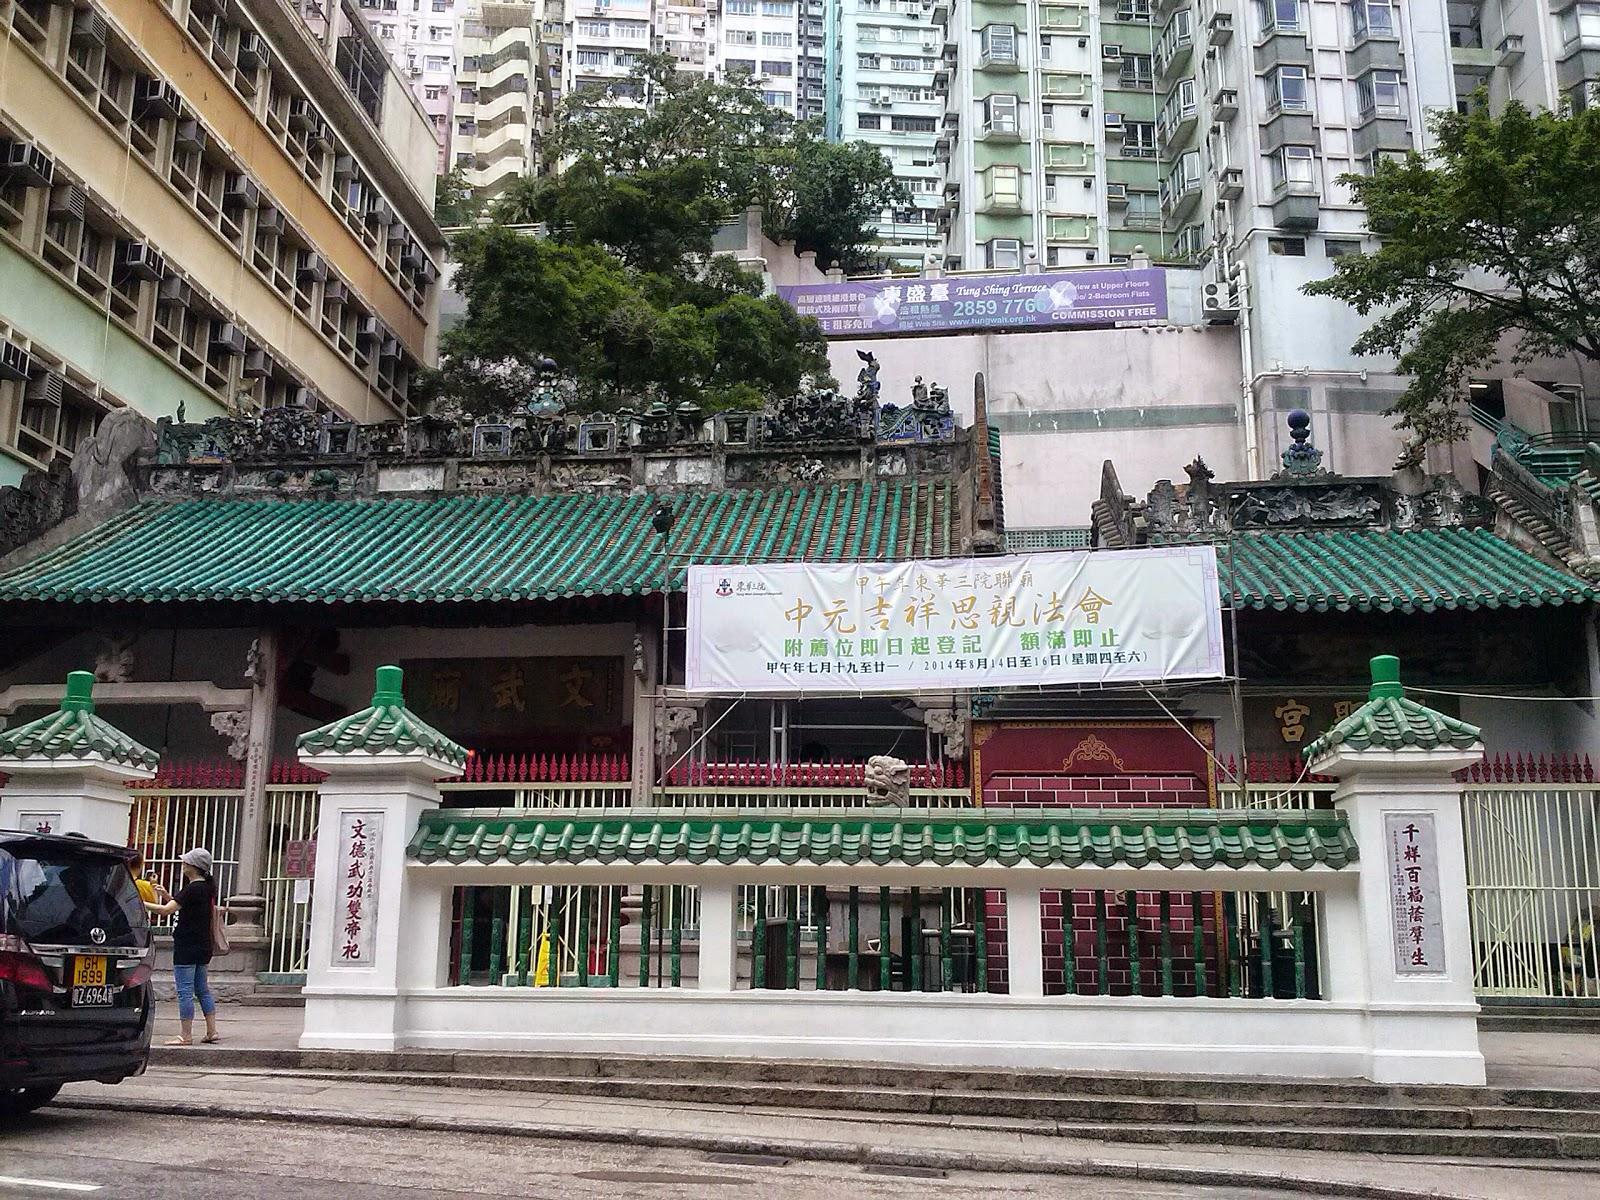 KaKa 的 Blog: 上環荷李活道 - 文武廟